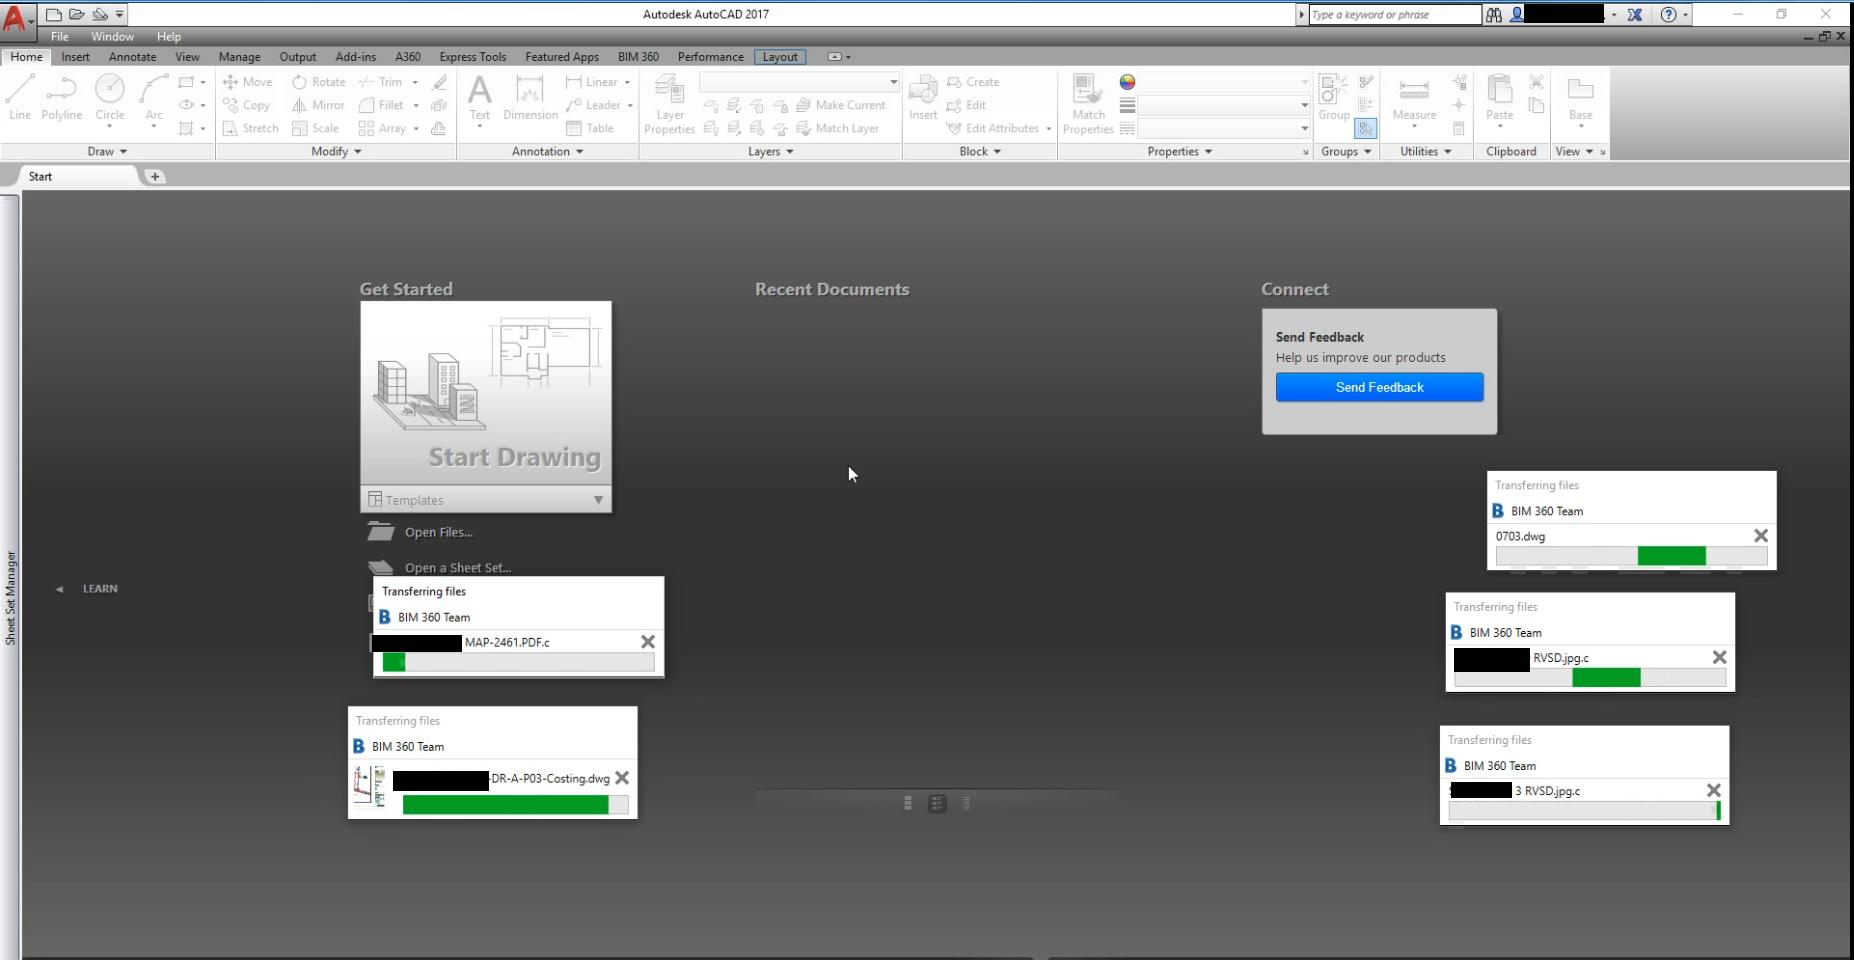 Desktop Connector: Transferring Files Loop - Autodesk Community- BIM